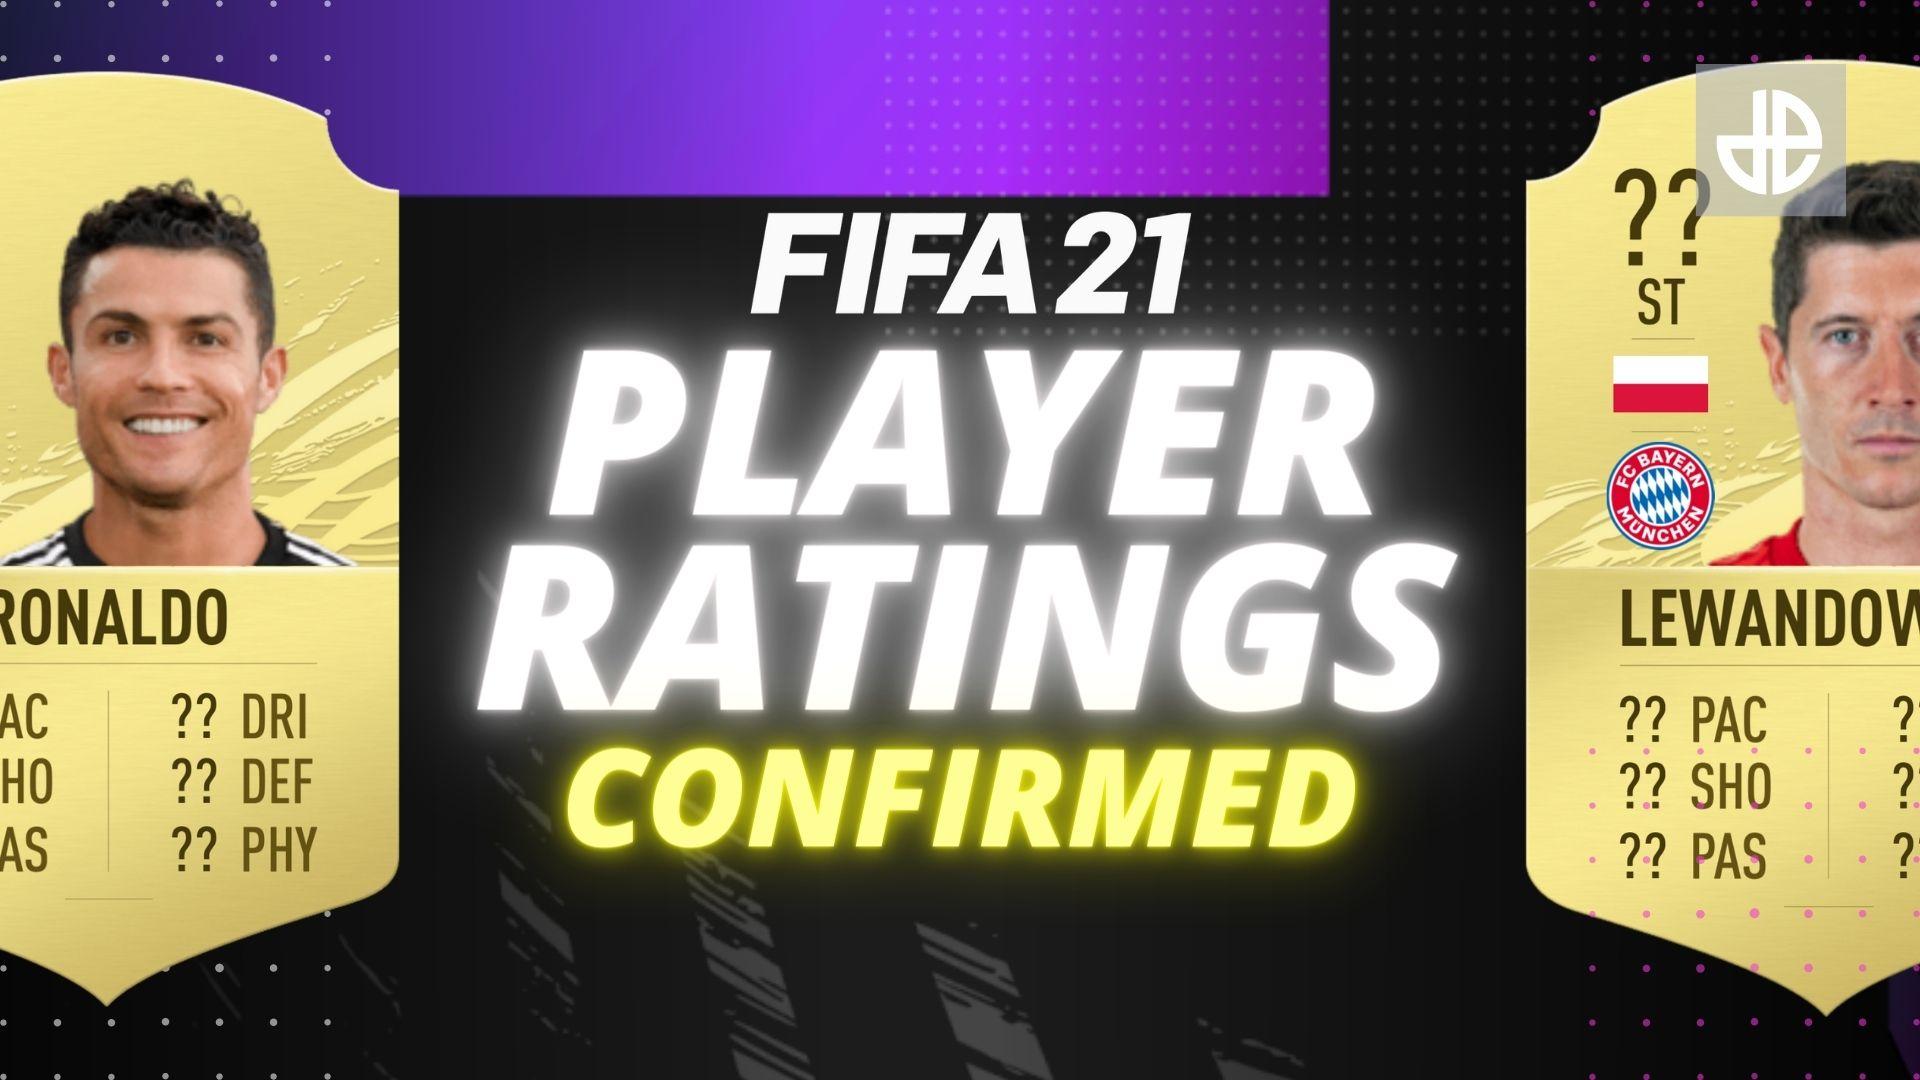 FIFA 21 ratings with Ronaldo and Lewandowski